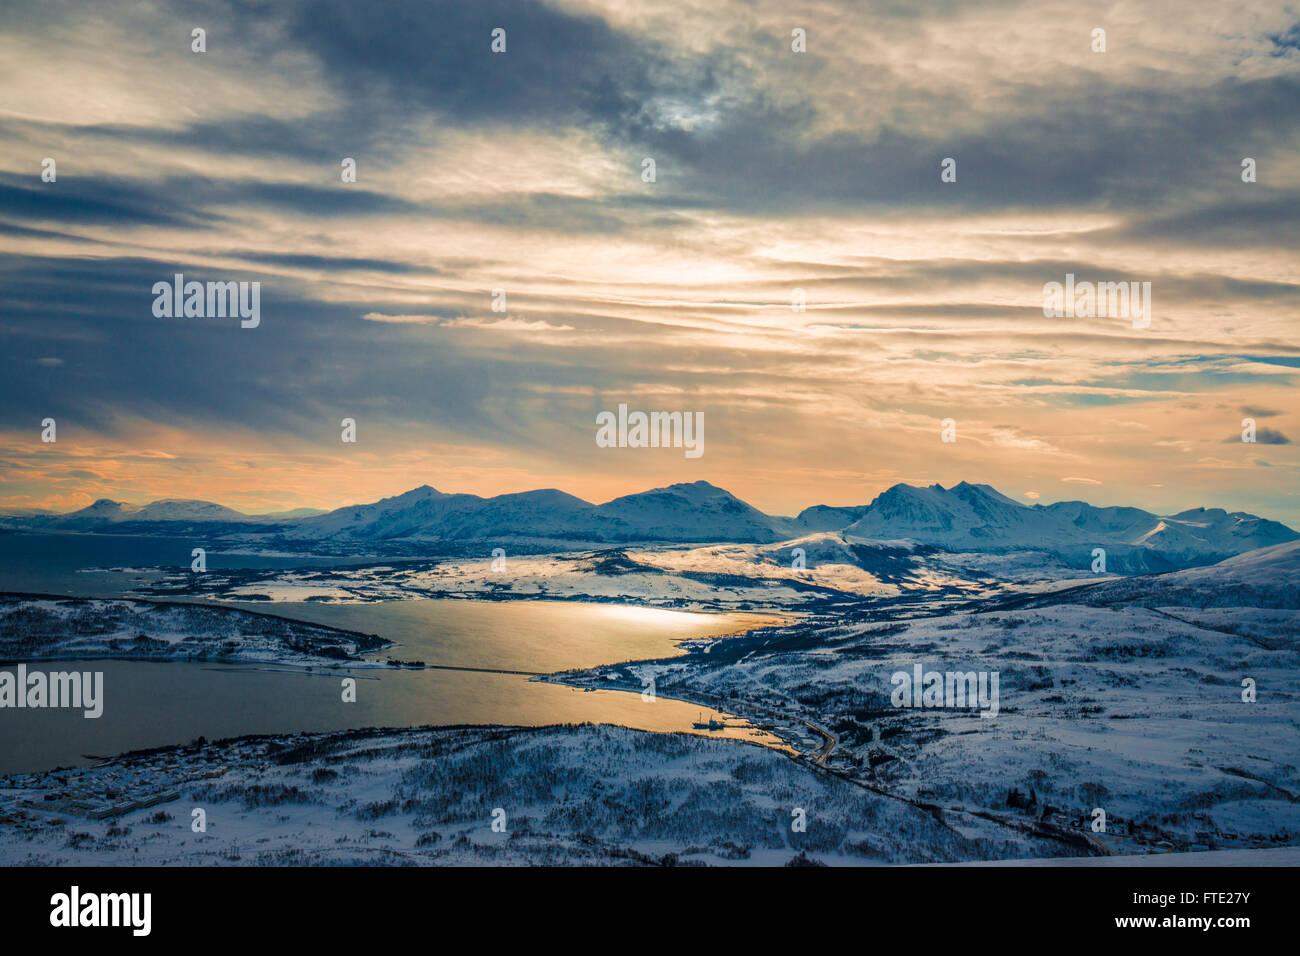 Berge in goldenes Licht aus Finnlandsfjellet, Kvaloya, Nordnorwegen getaucht Stockbild